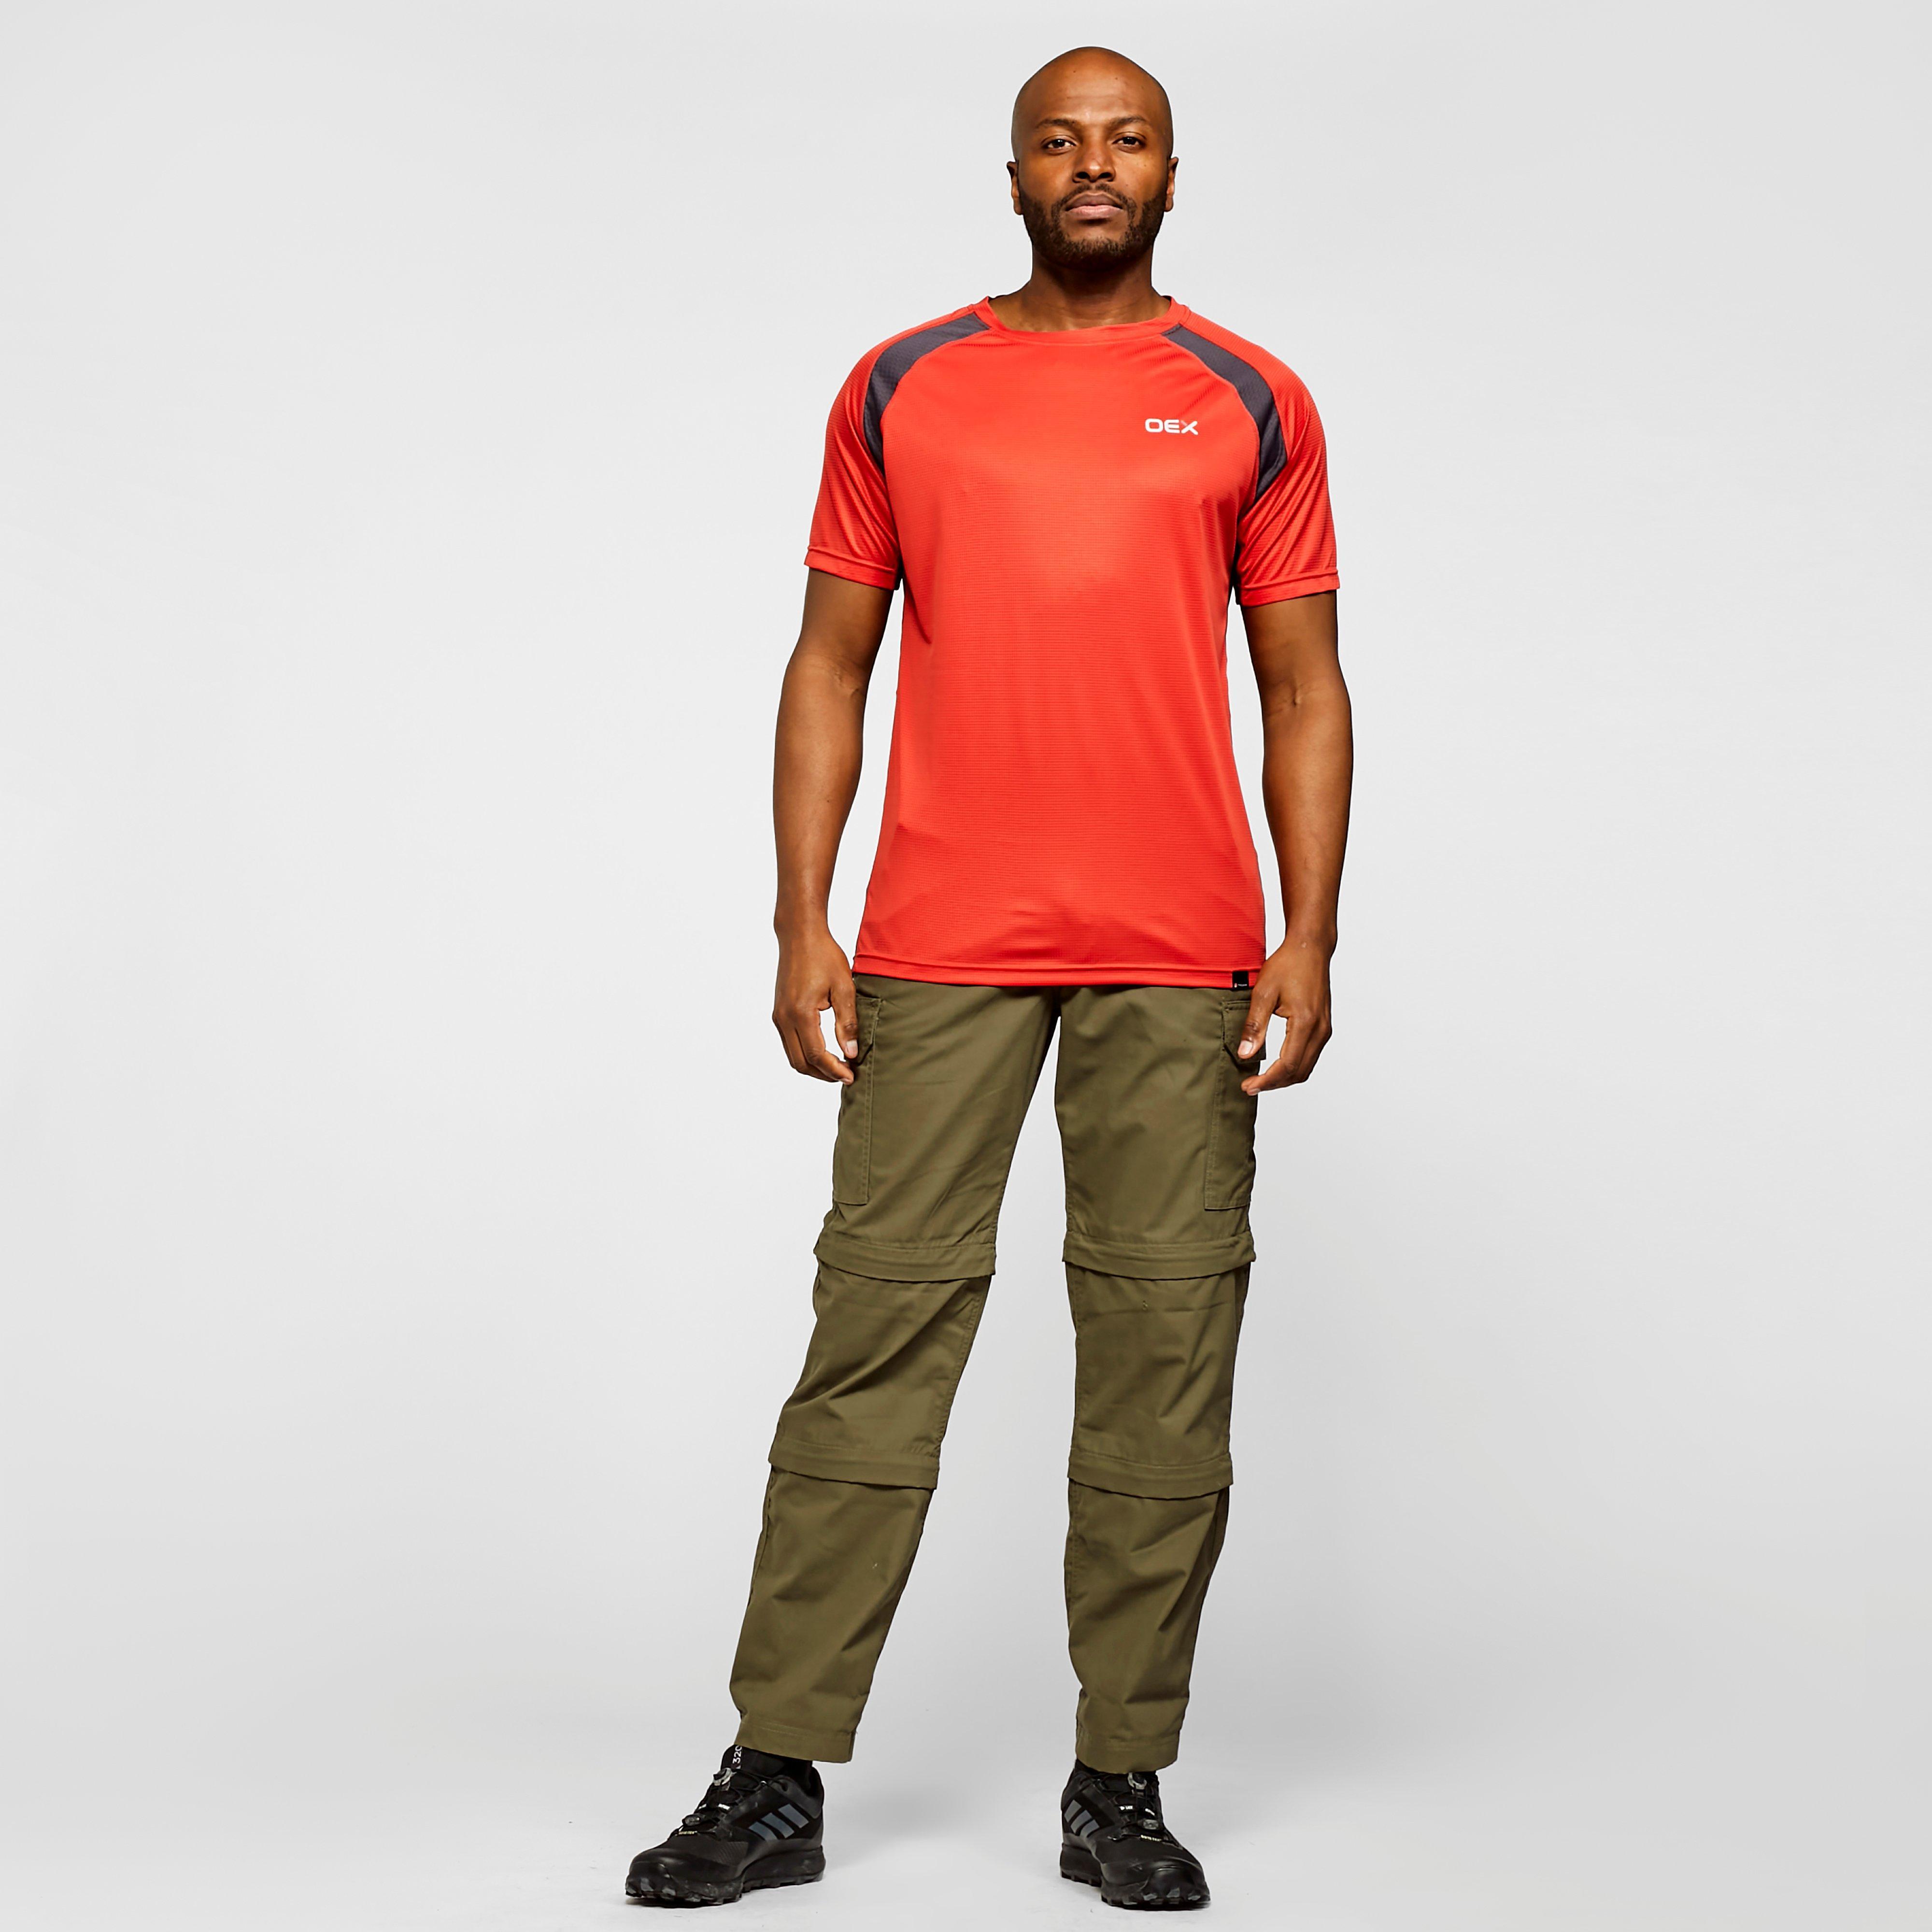 Oex Oex Mens Zephyr Short Sleeve T-Shirt, Red